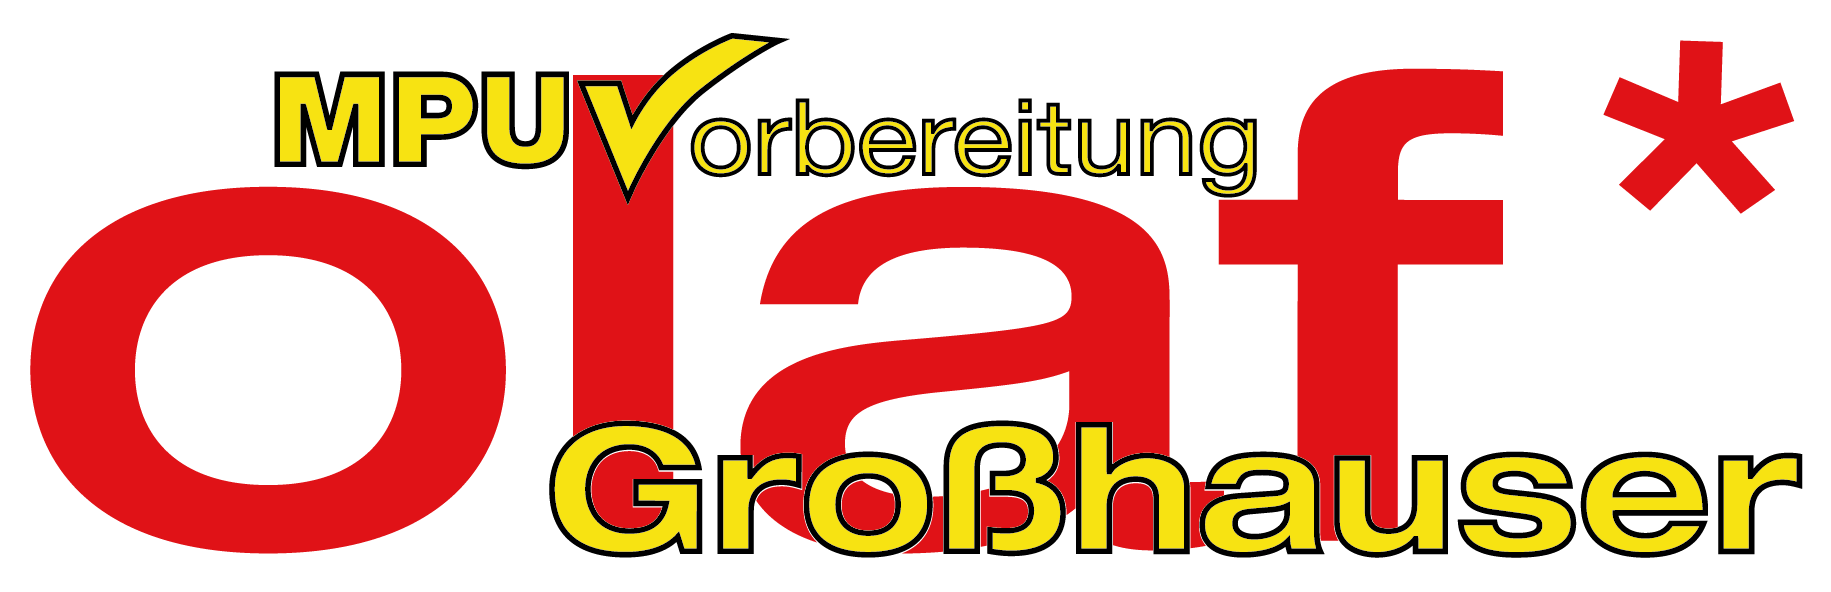 MPU-Vorbereitung Hilpoltstein - Roth - Allersberg